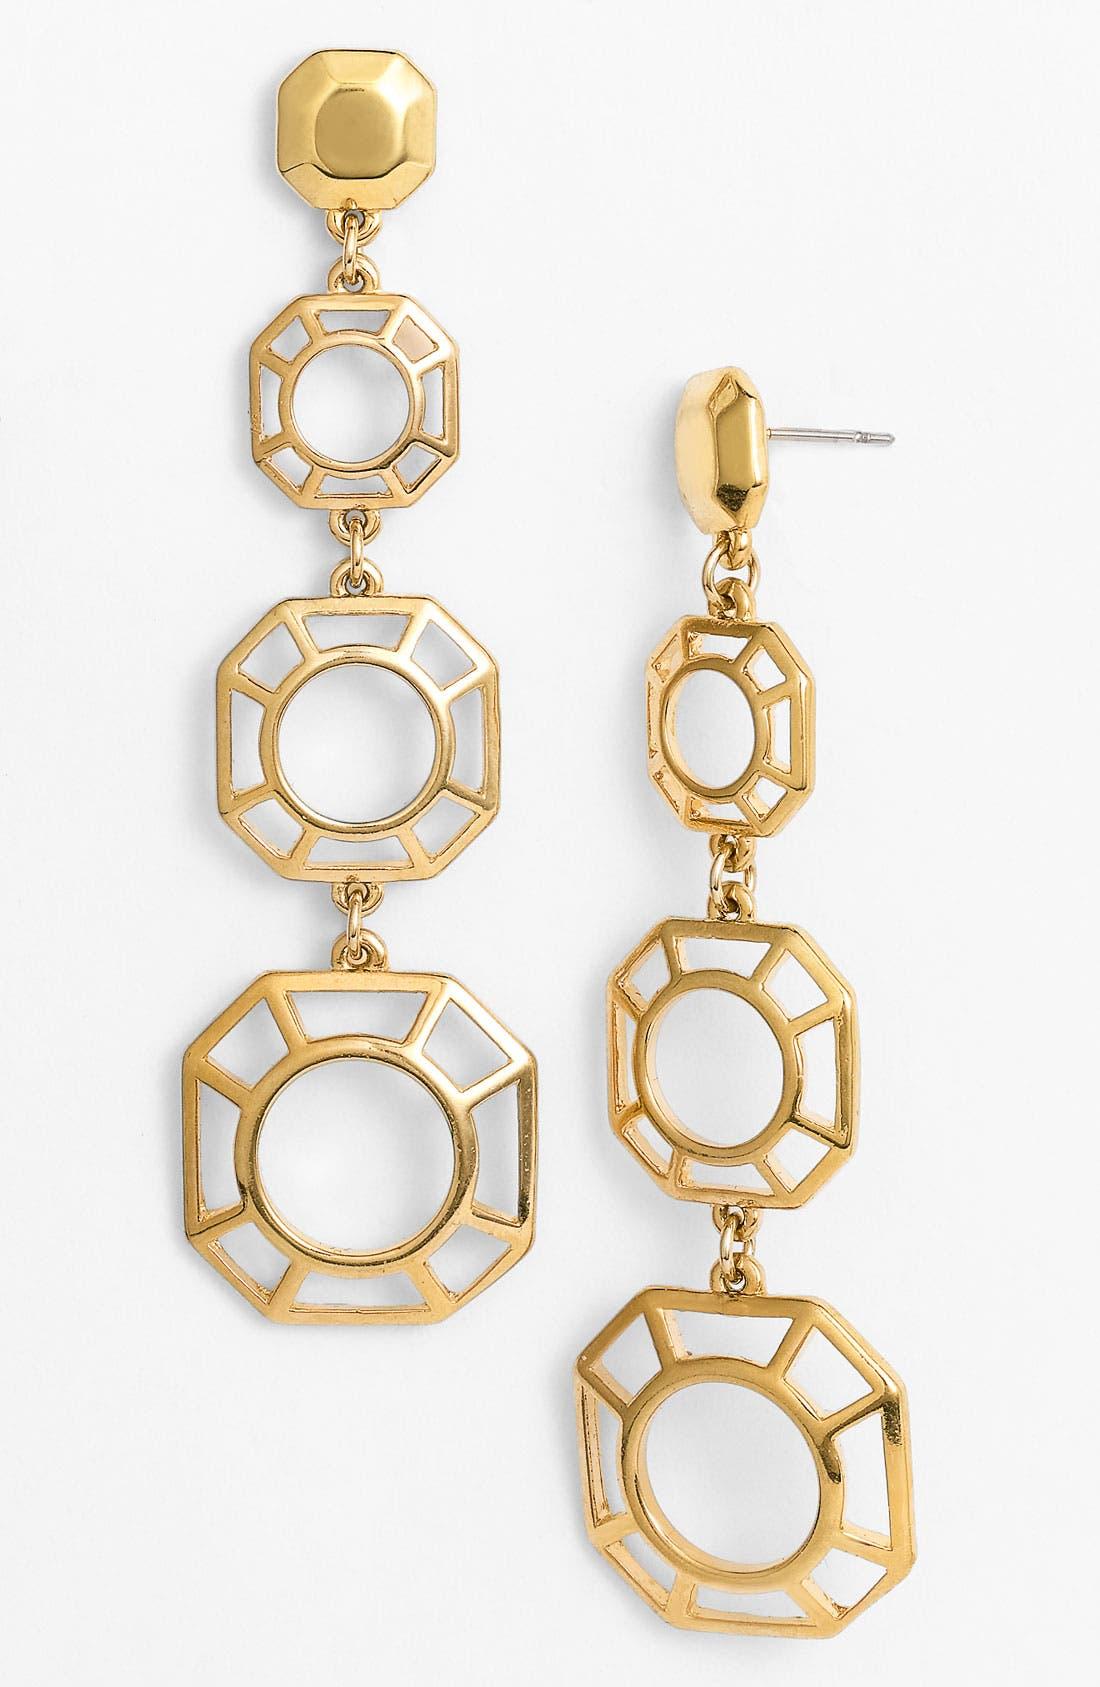 Main Image - Tory Burch 'Audrina' Linear Earrings